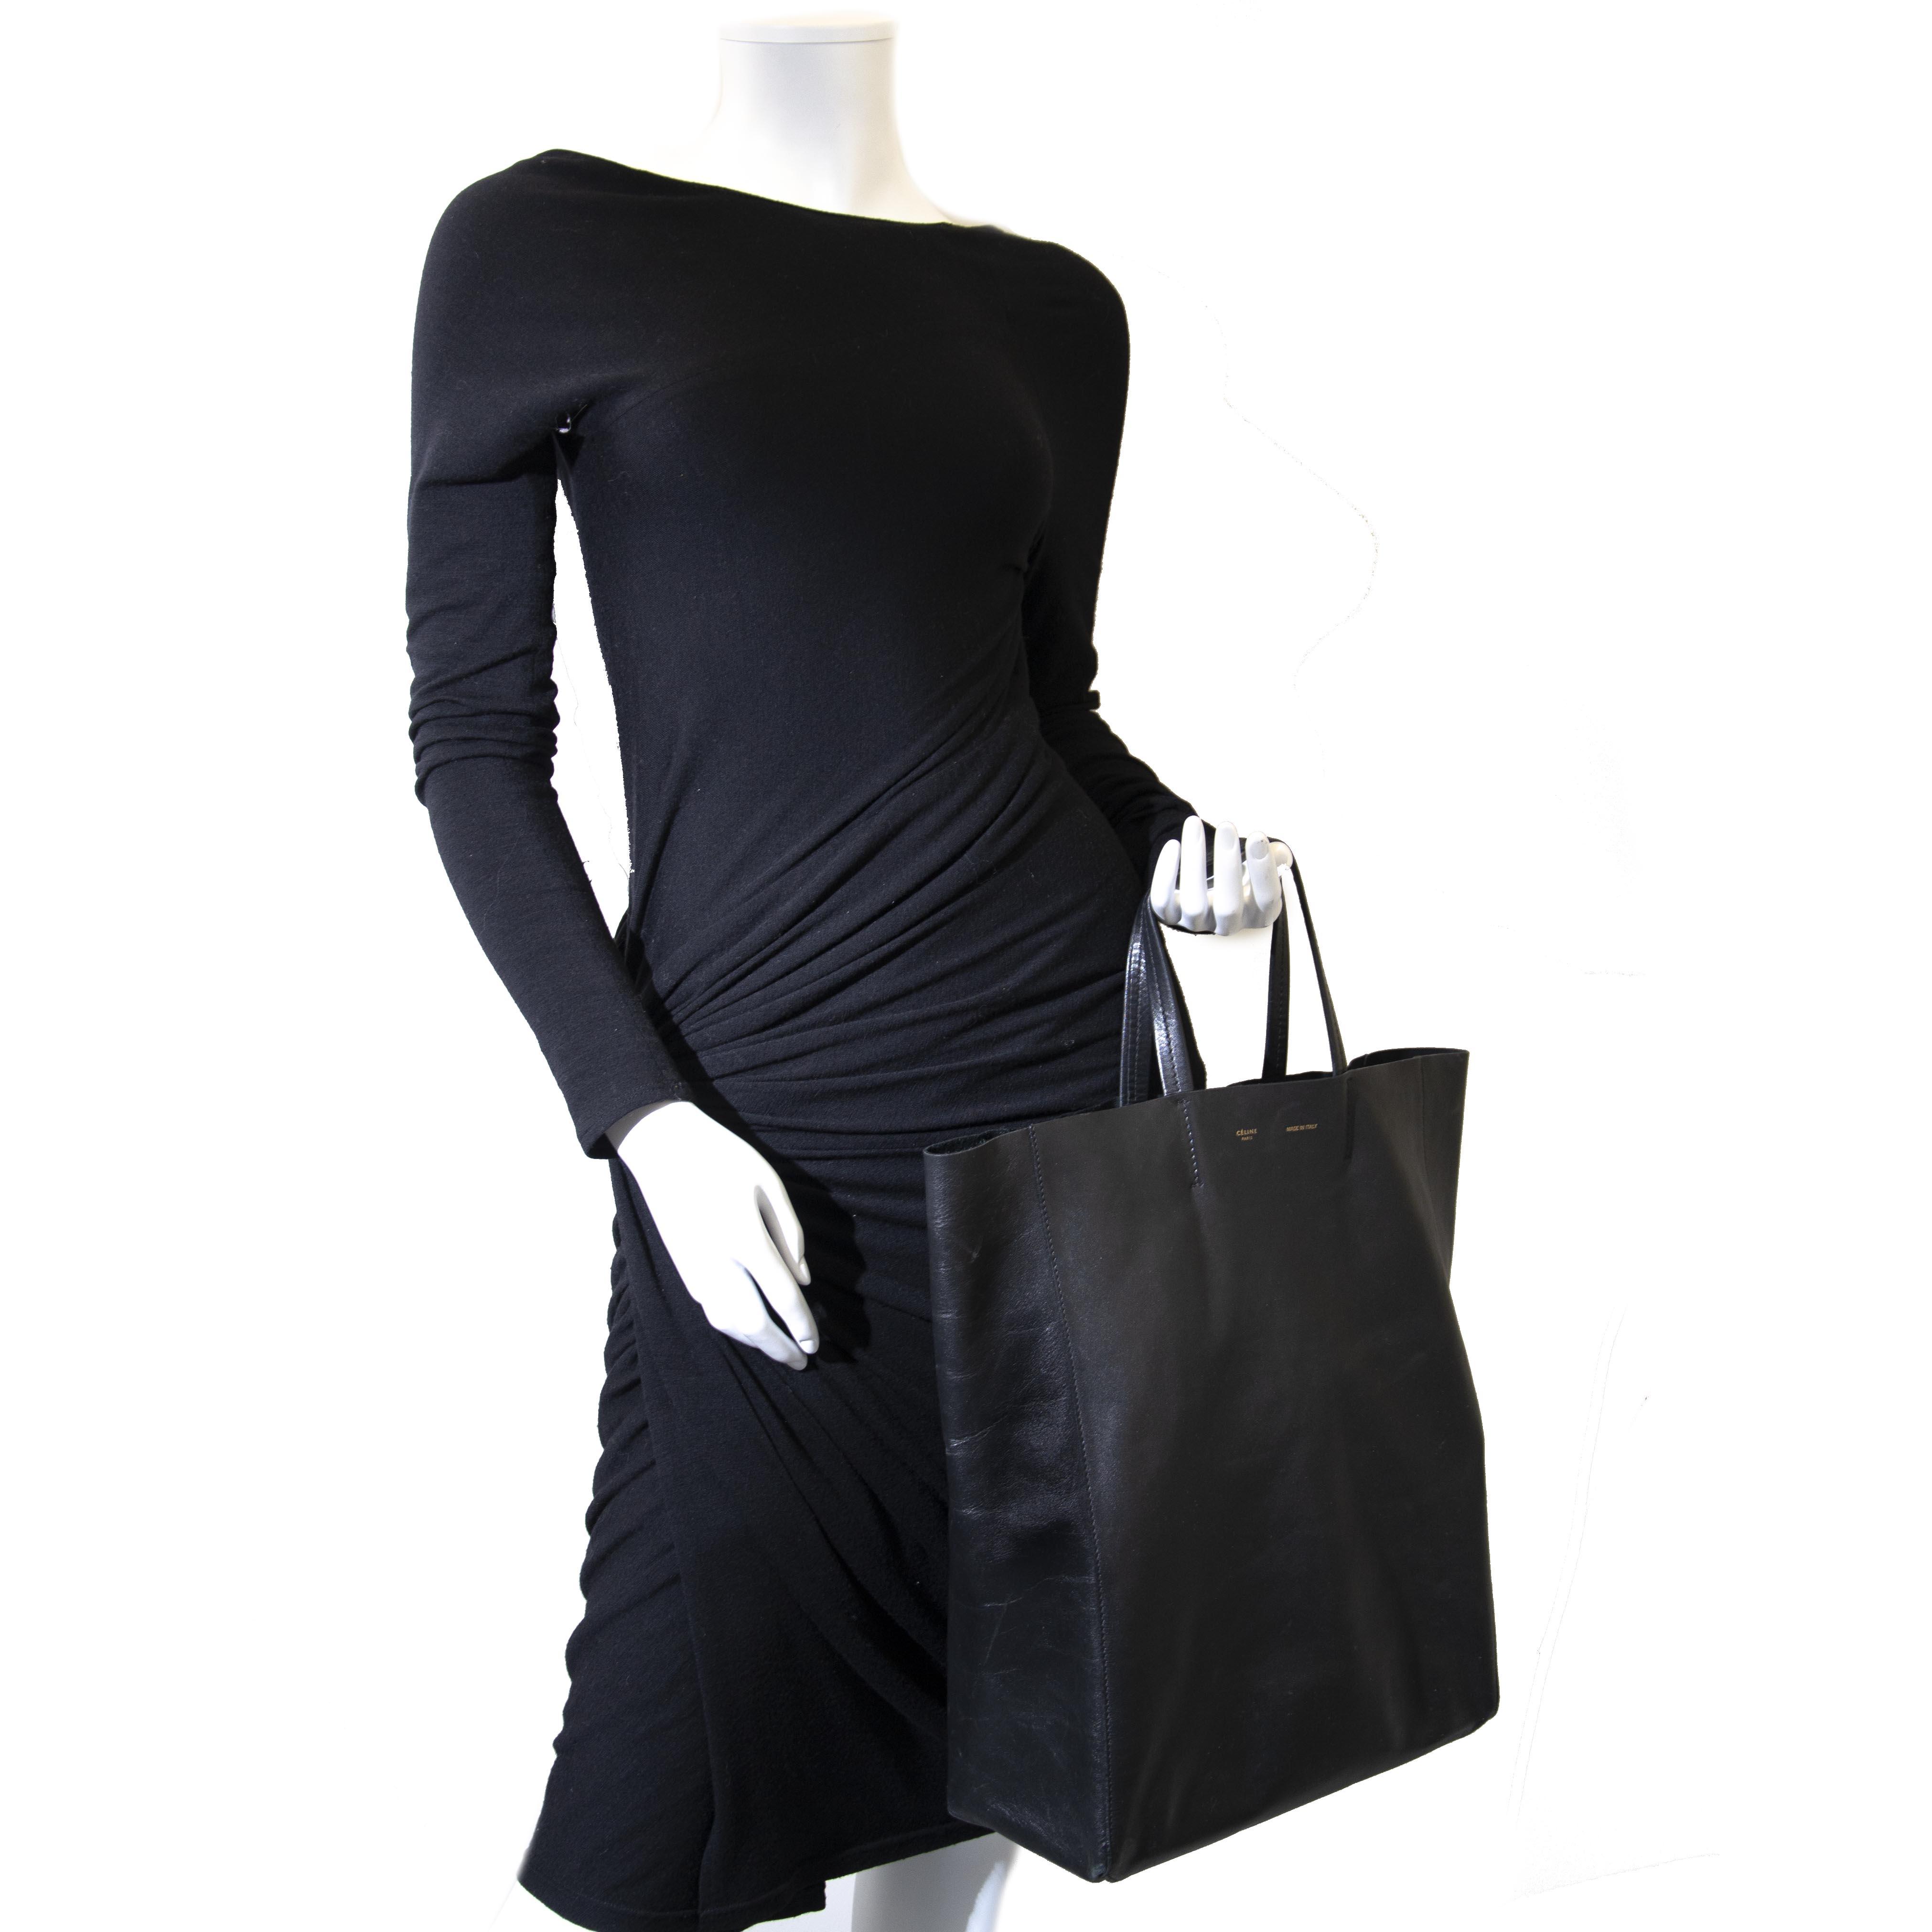 Celine Black Tote Bag. Buy authentic Celine bag at Labellov. Koop authentieke tweedehands Celine handtassen bij Labellov.